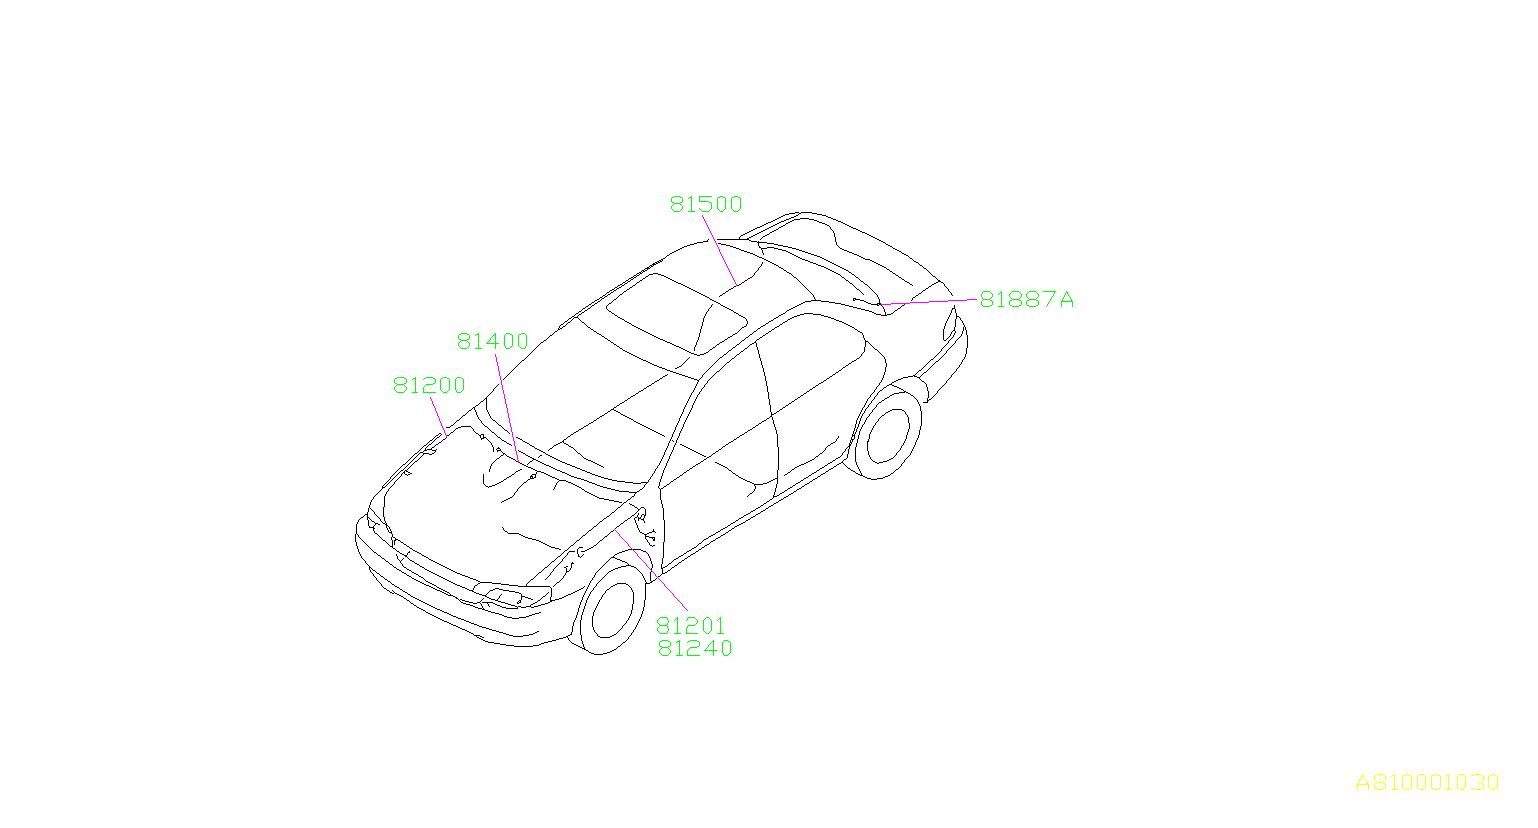 Subaru Impreza Wiring Harness. (Front). MAIN, Electrical